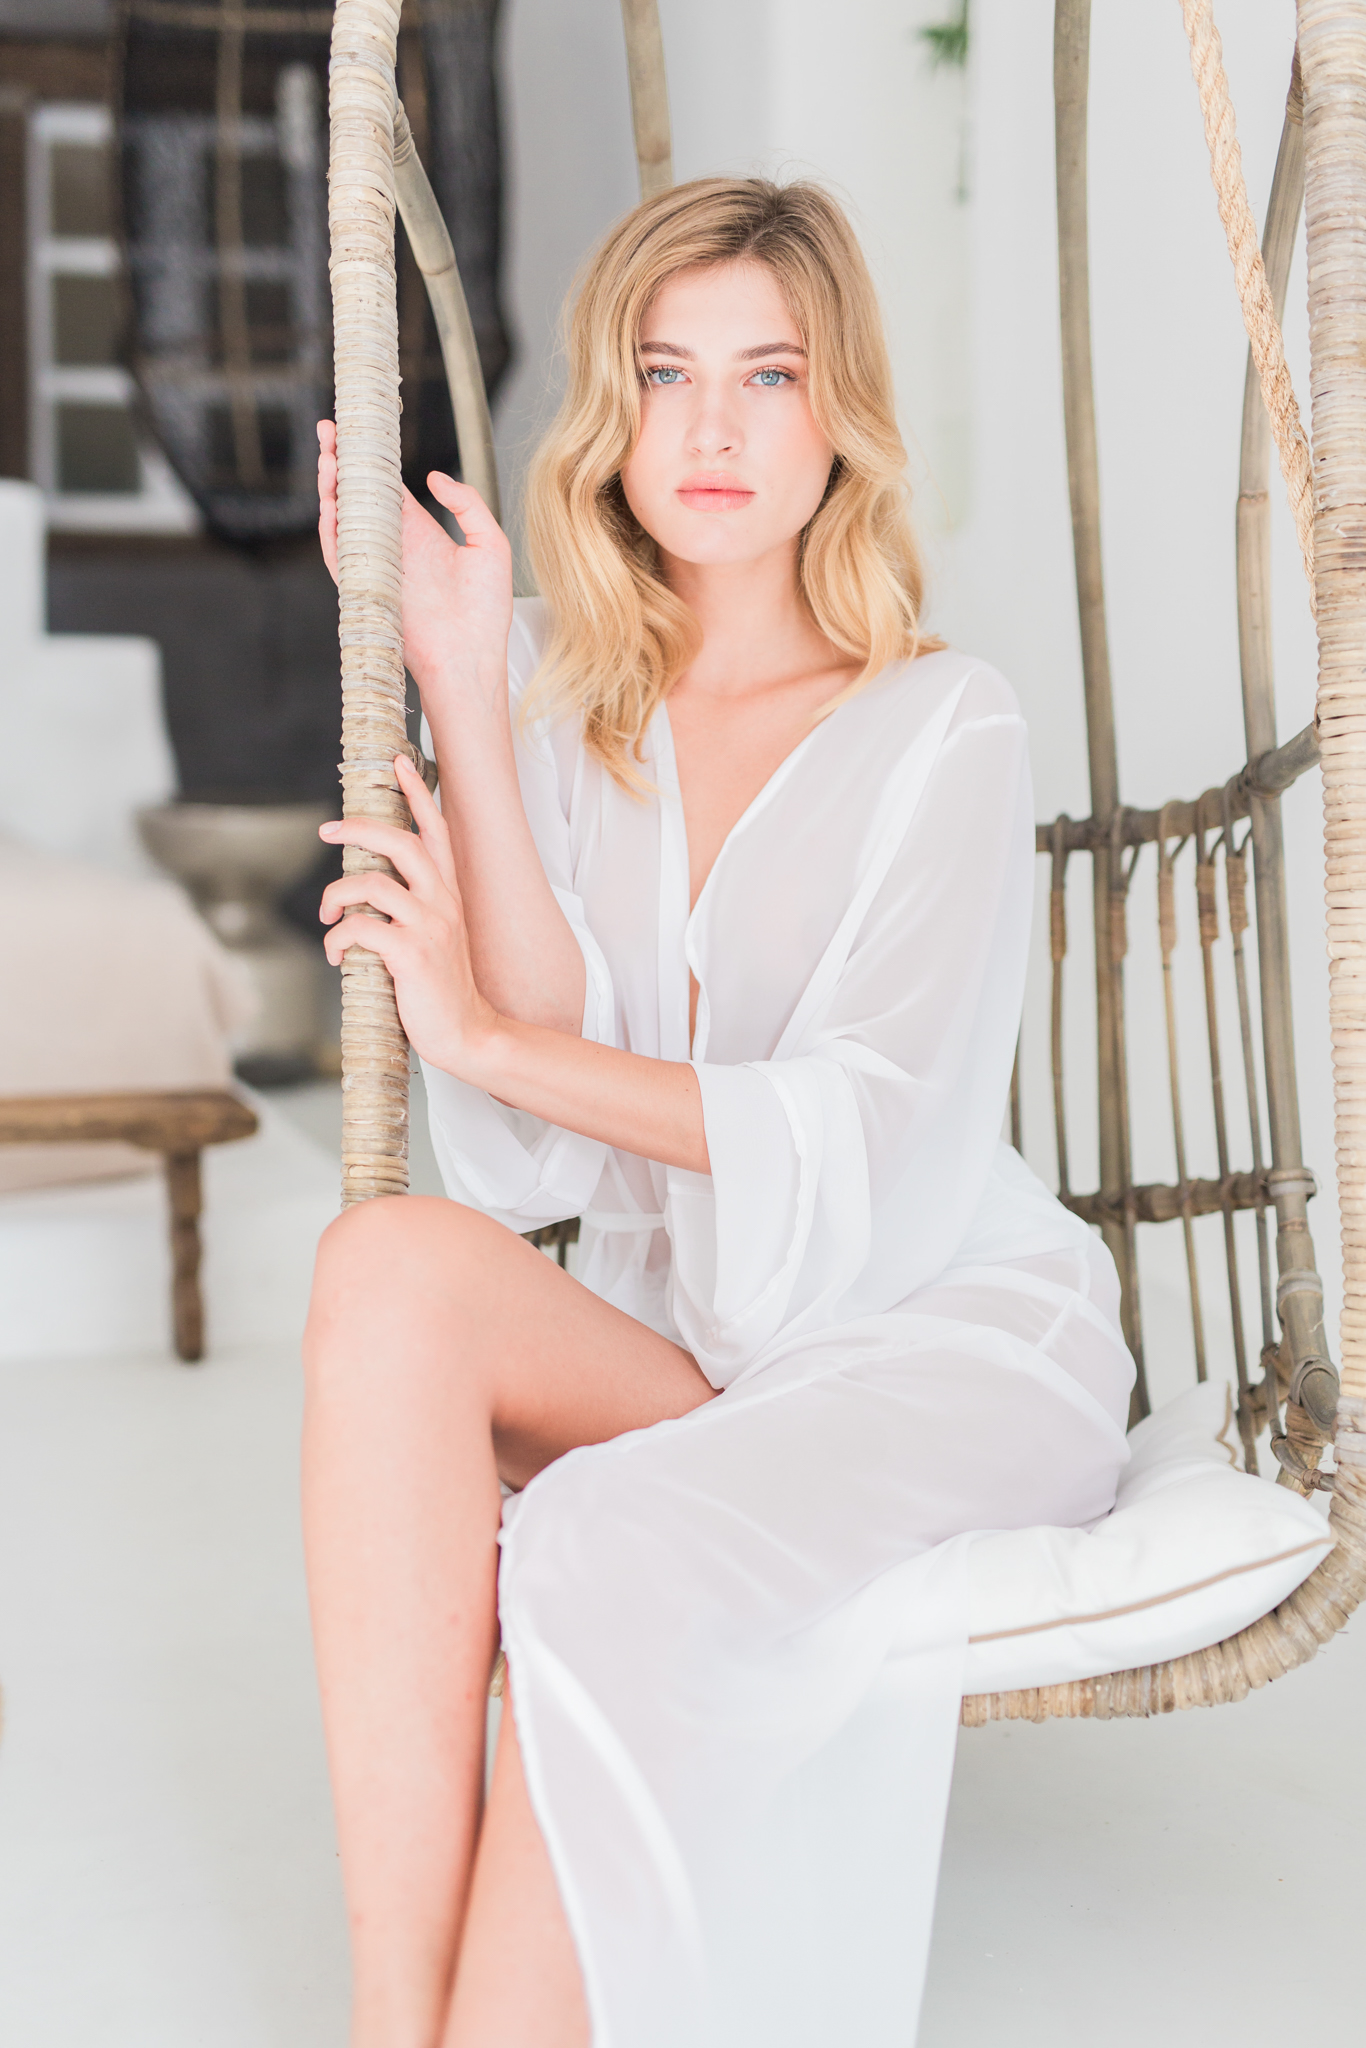 Suzanne_Li_photography_WEDDING_greece_lingerie-3.jpg